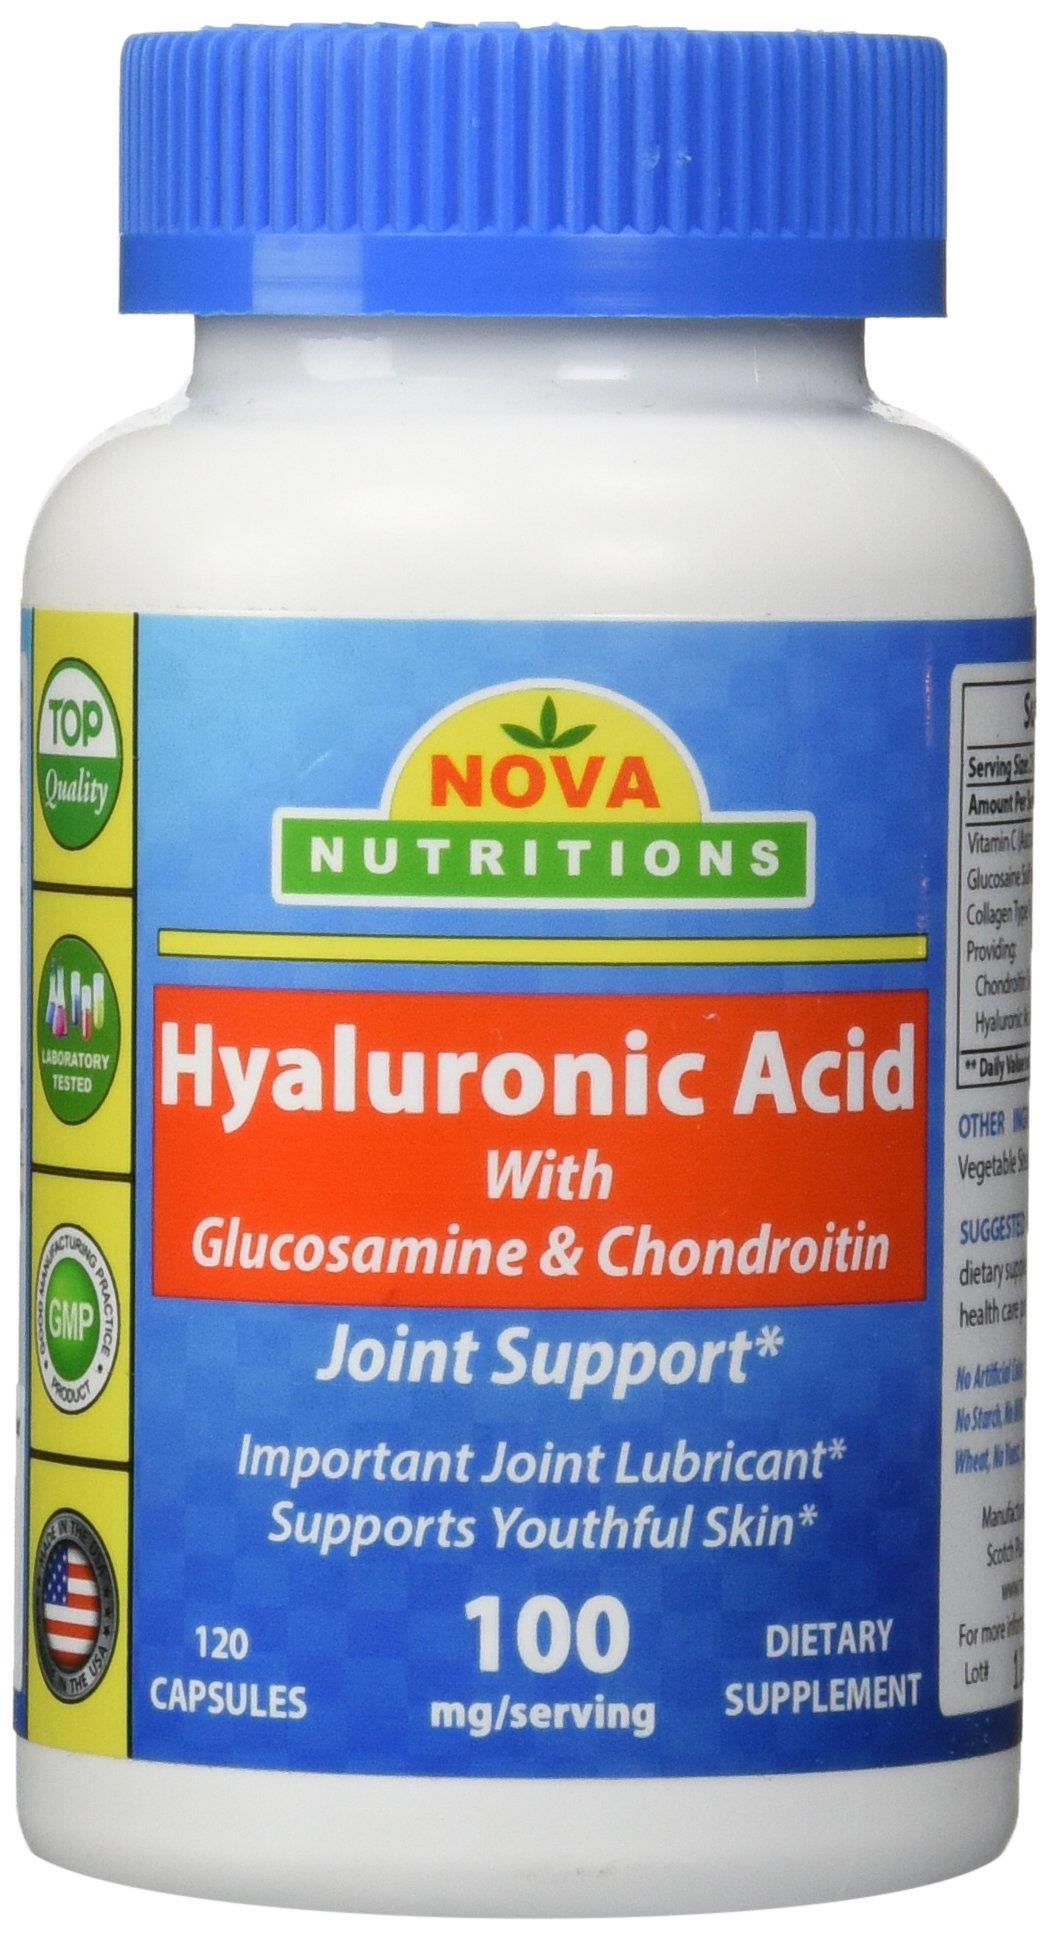 Nova Nutritions Hyaluronic Acid 100 mg per serving 120 Capsules